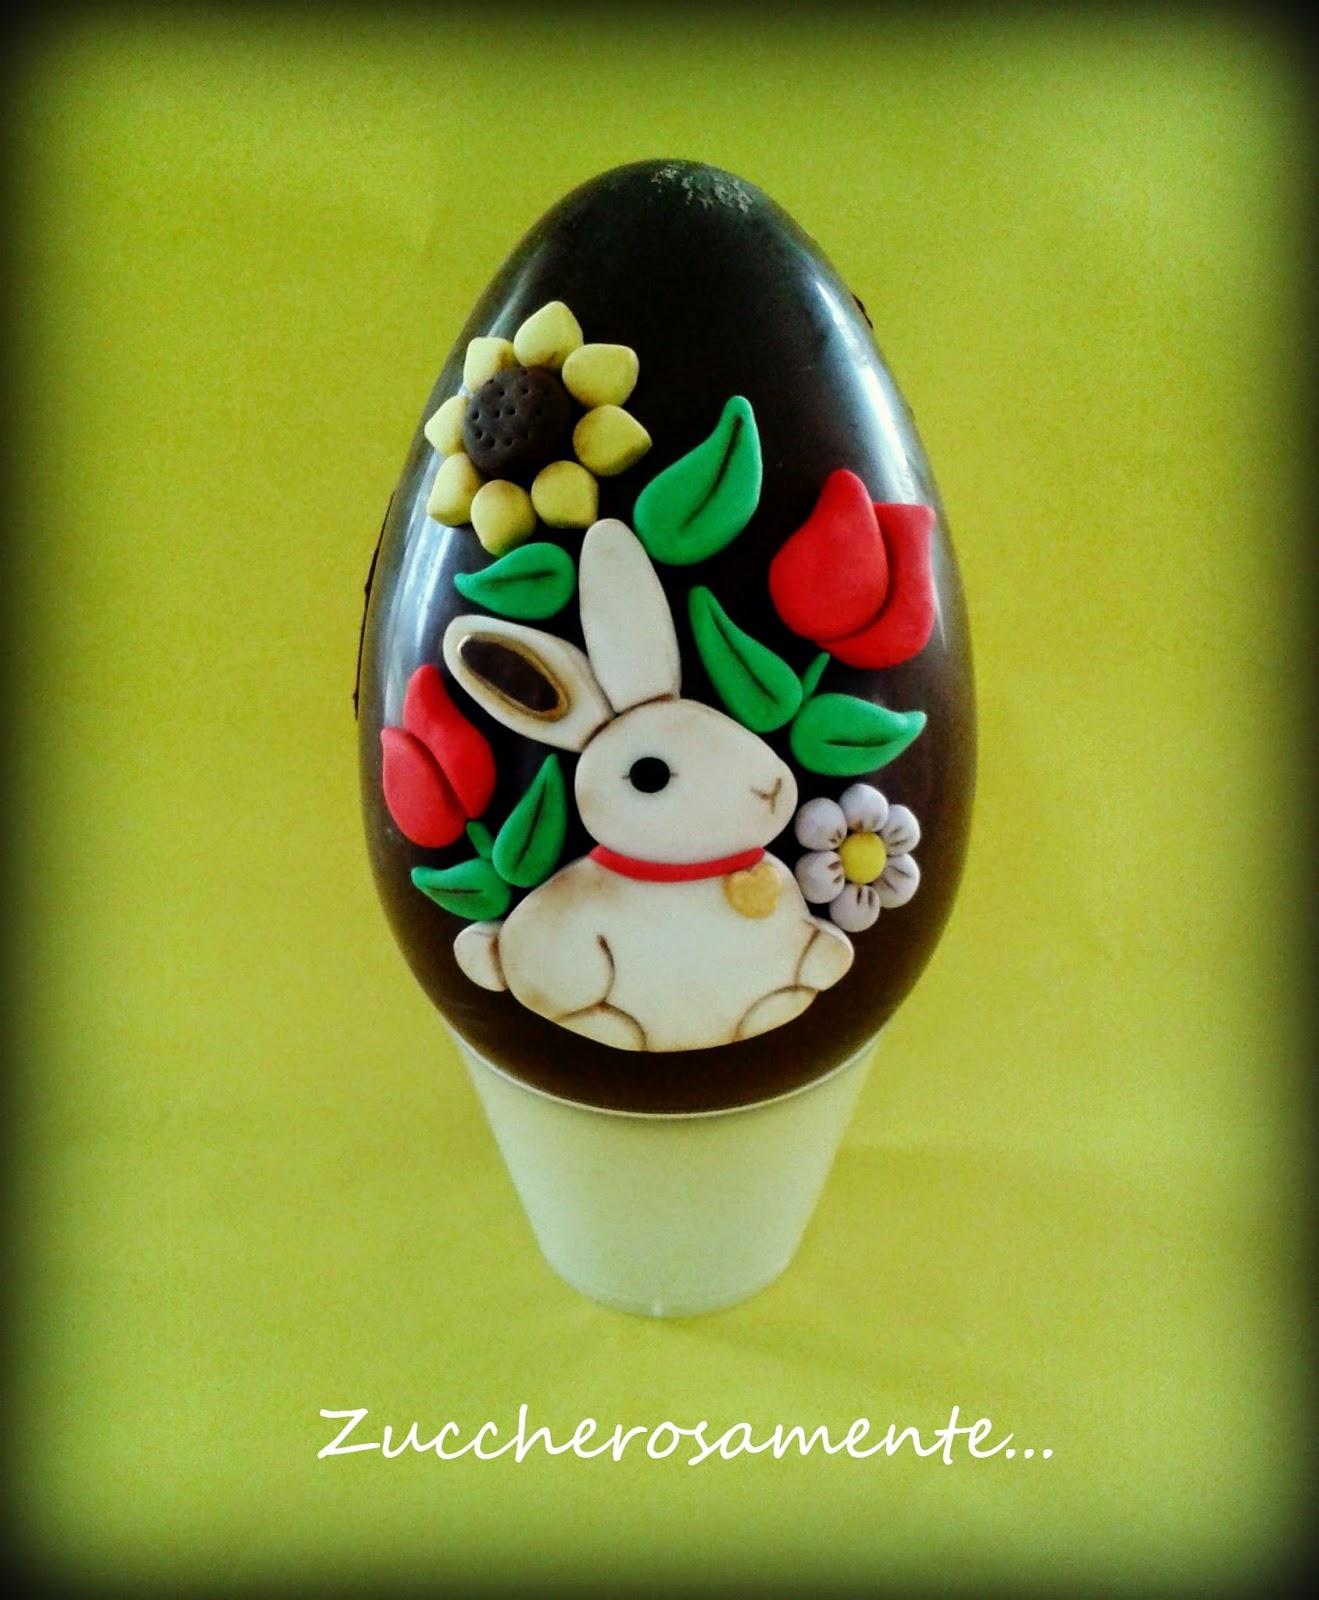 Cake Design Provincia Varese : Zuccherosamente...: Uova di pasqua decorate stile thun